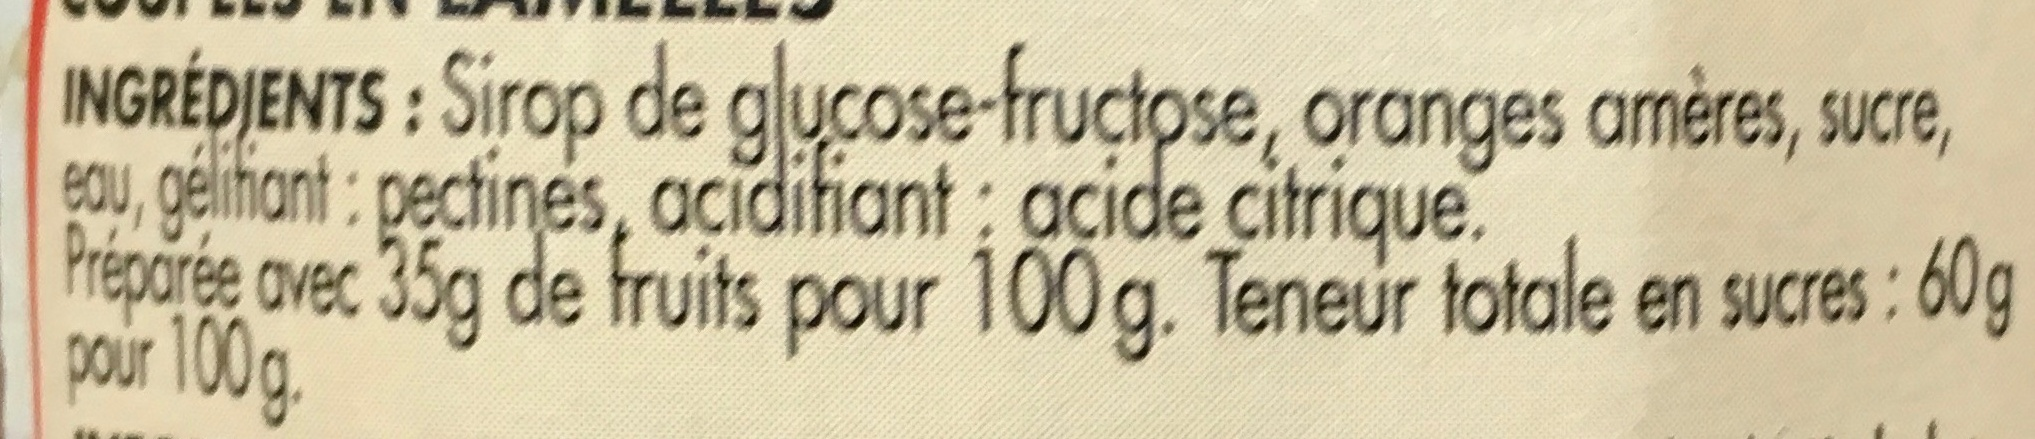 Marmelade d'Oranges - Ingrédients - fr